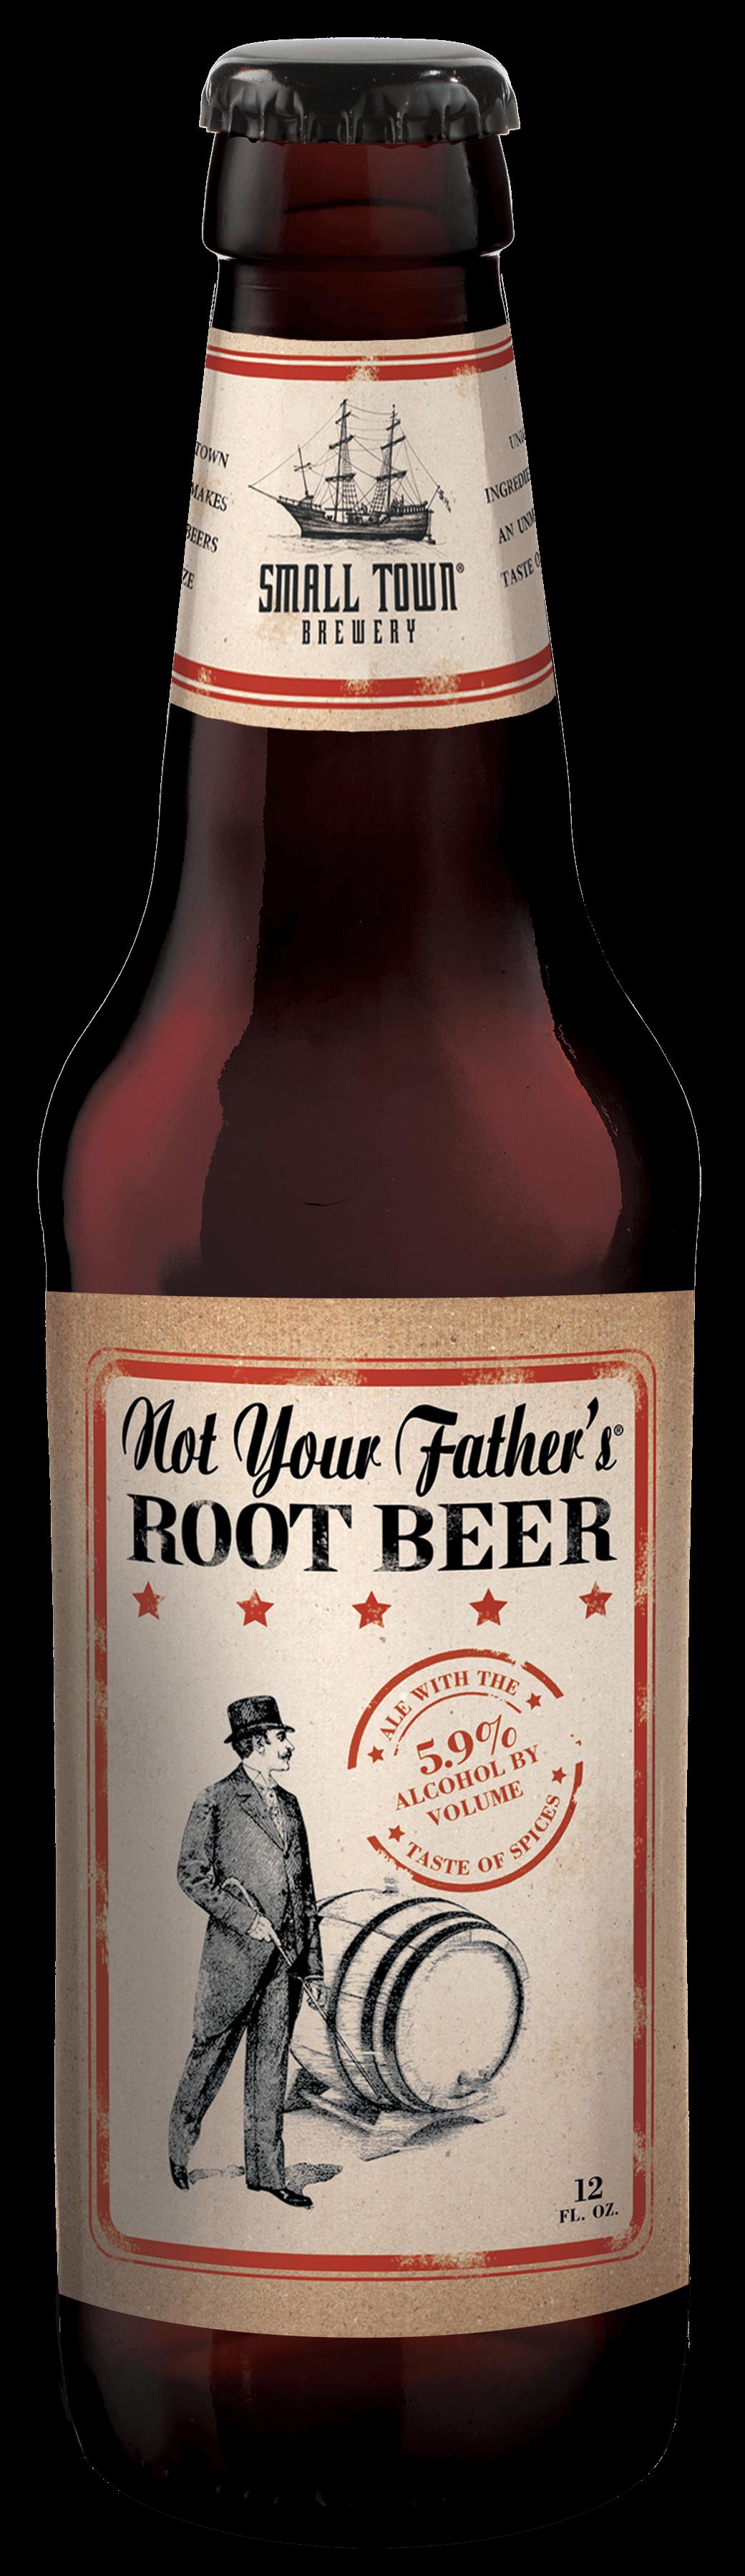 Root Beer Wallpapers Food Hq Root Beer Pictures 4k Wallpapers 2019